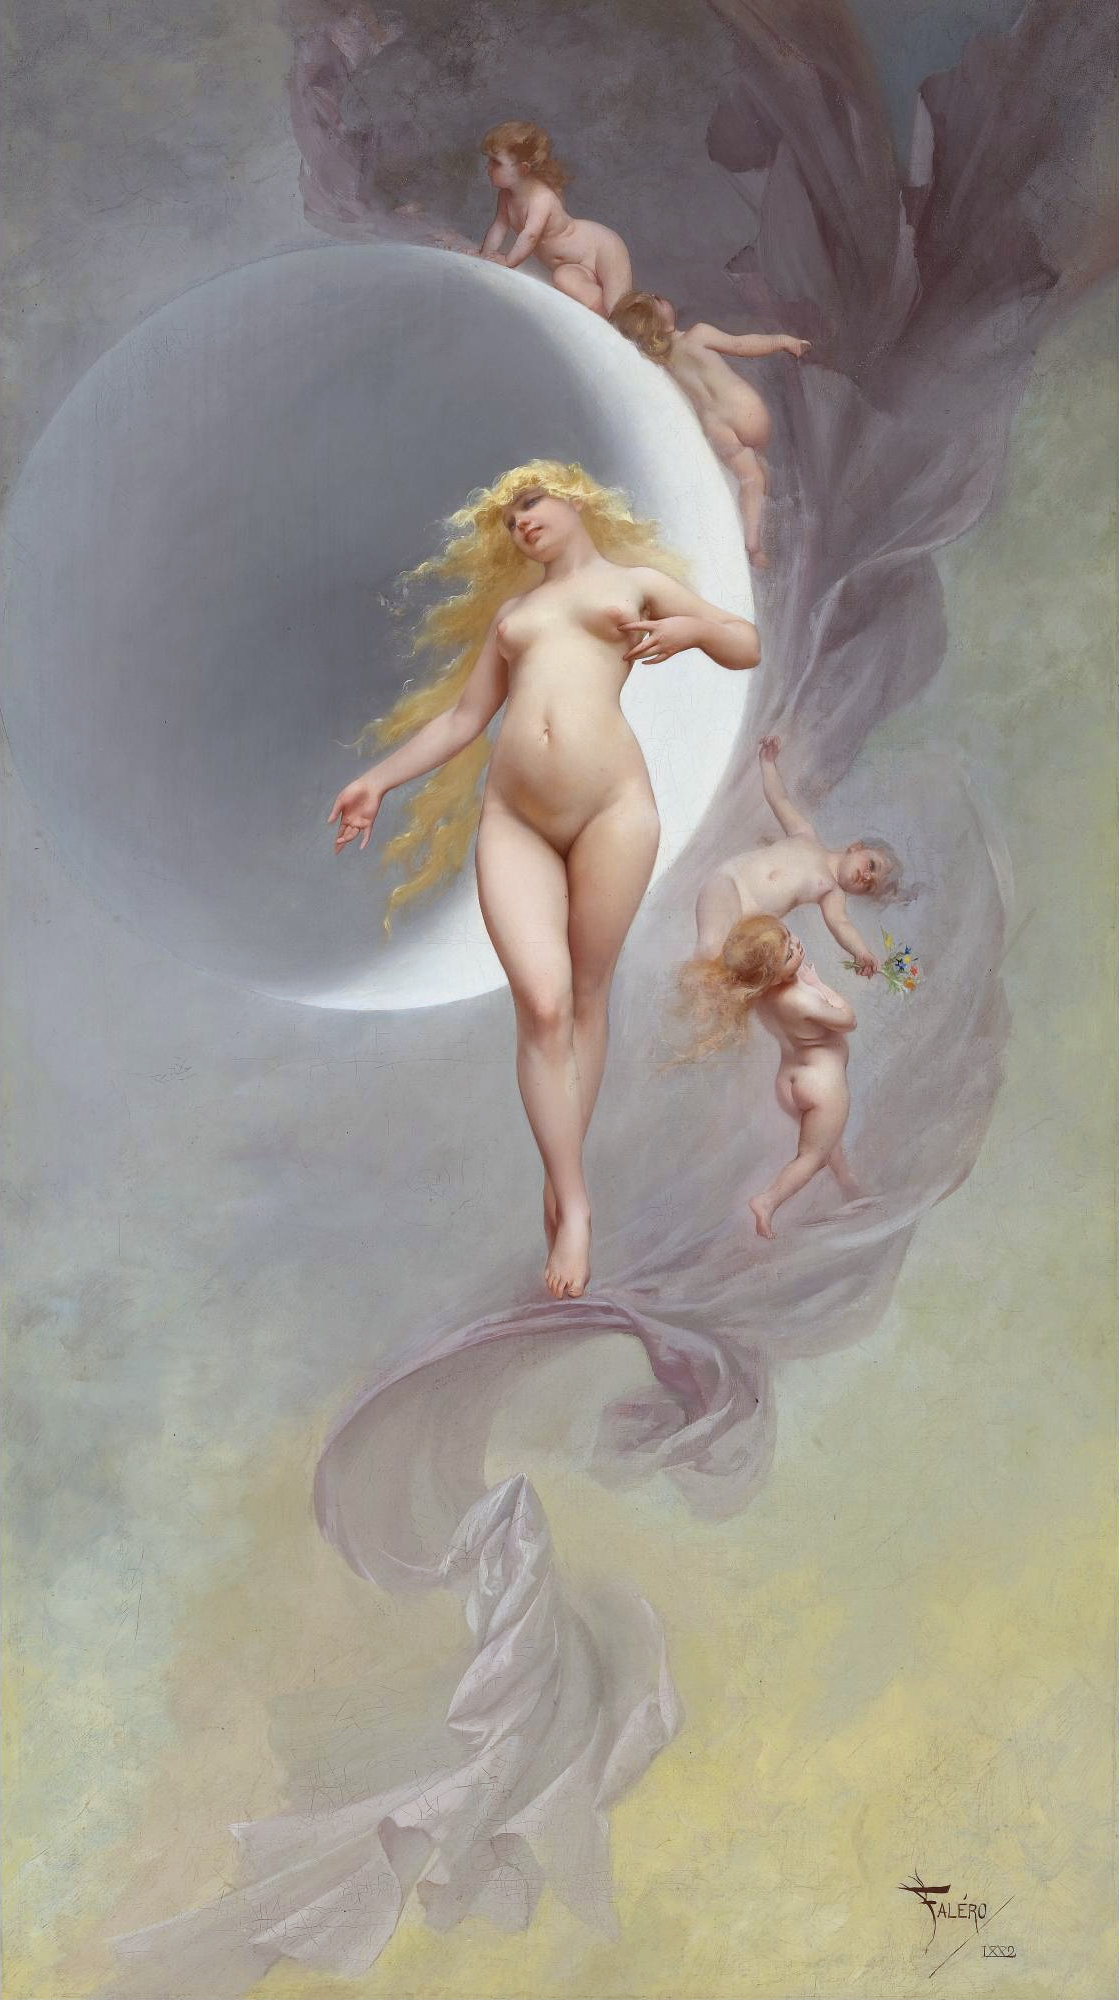 http://upload.wikimedia.org/wikipedia/commons/5/5a/The_Planet_Venus_by_Luis_Ricardo_Falero.jpg